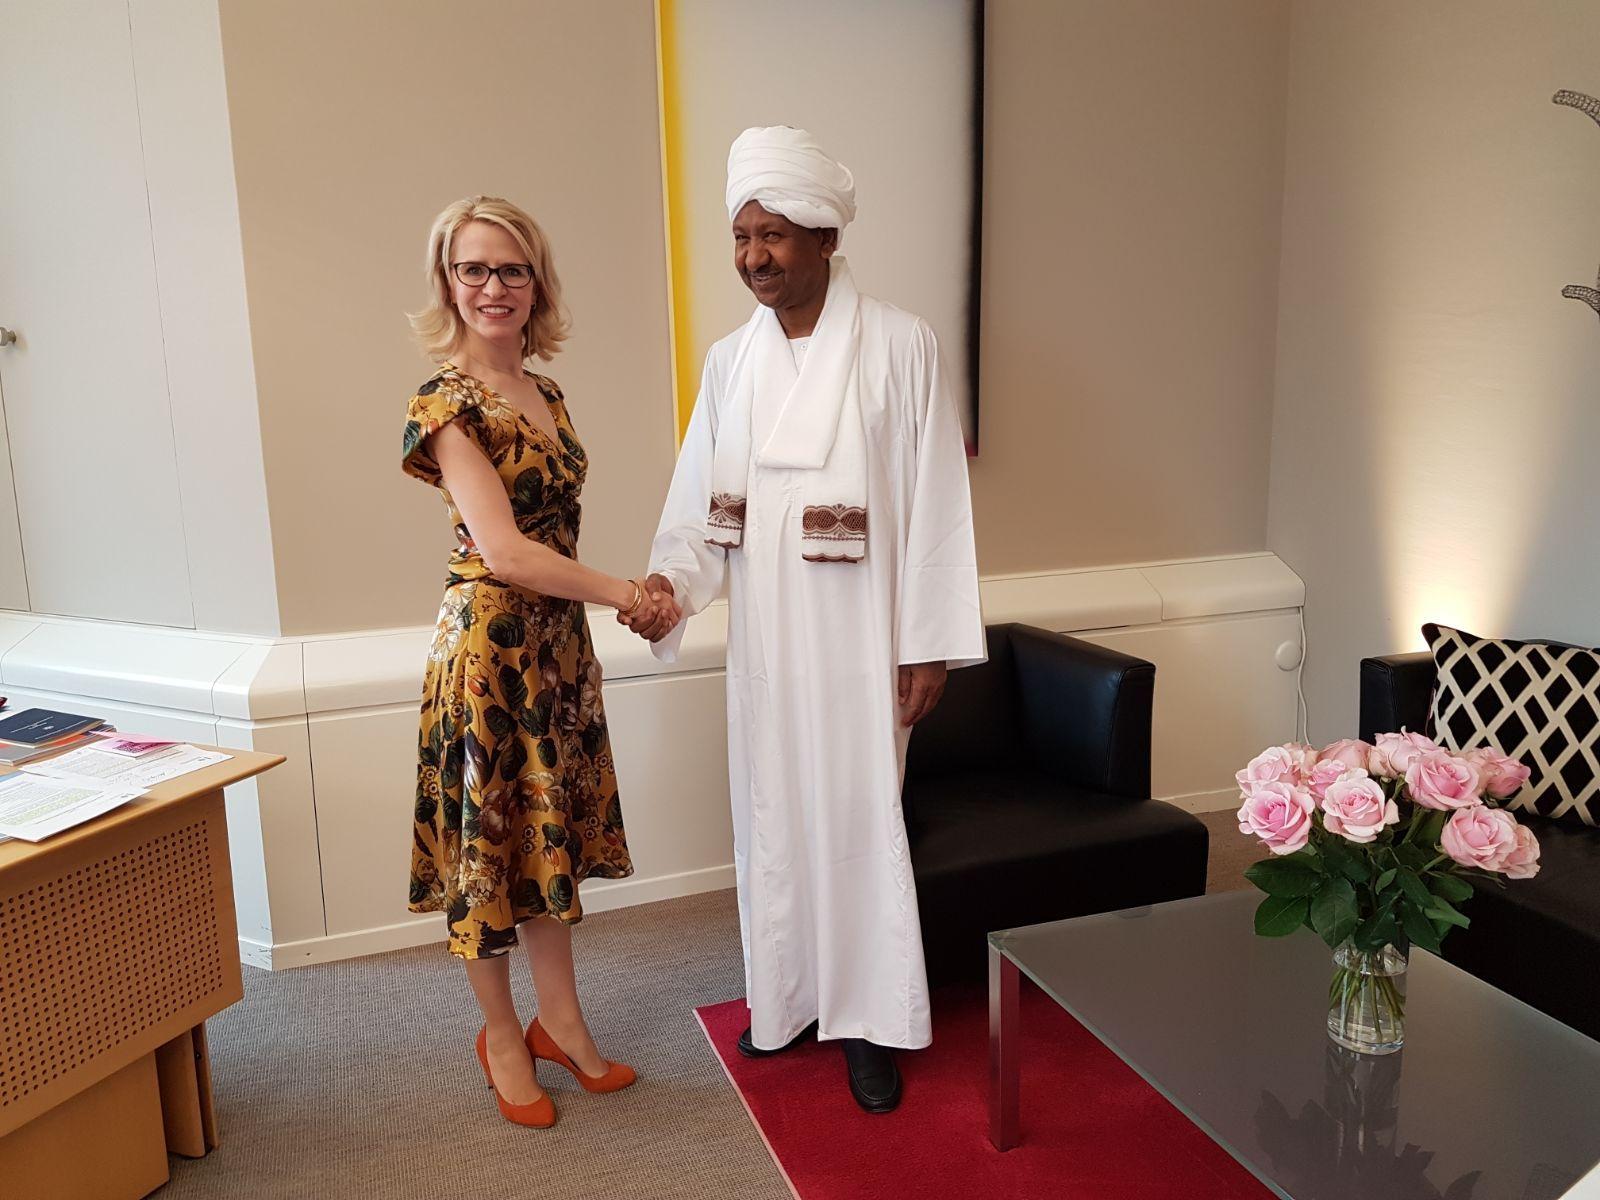 د. مصطفي عثمان سفيراً غير مقيم بإمارة ليختنشتاين